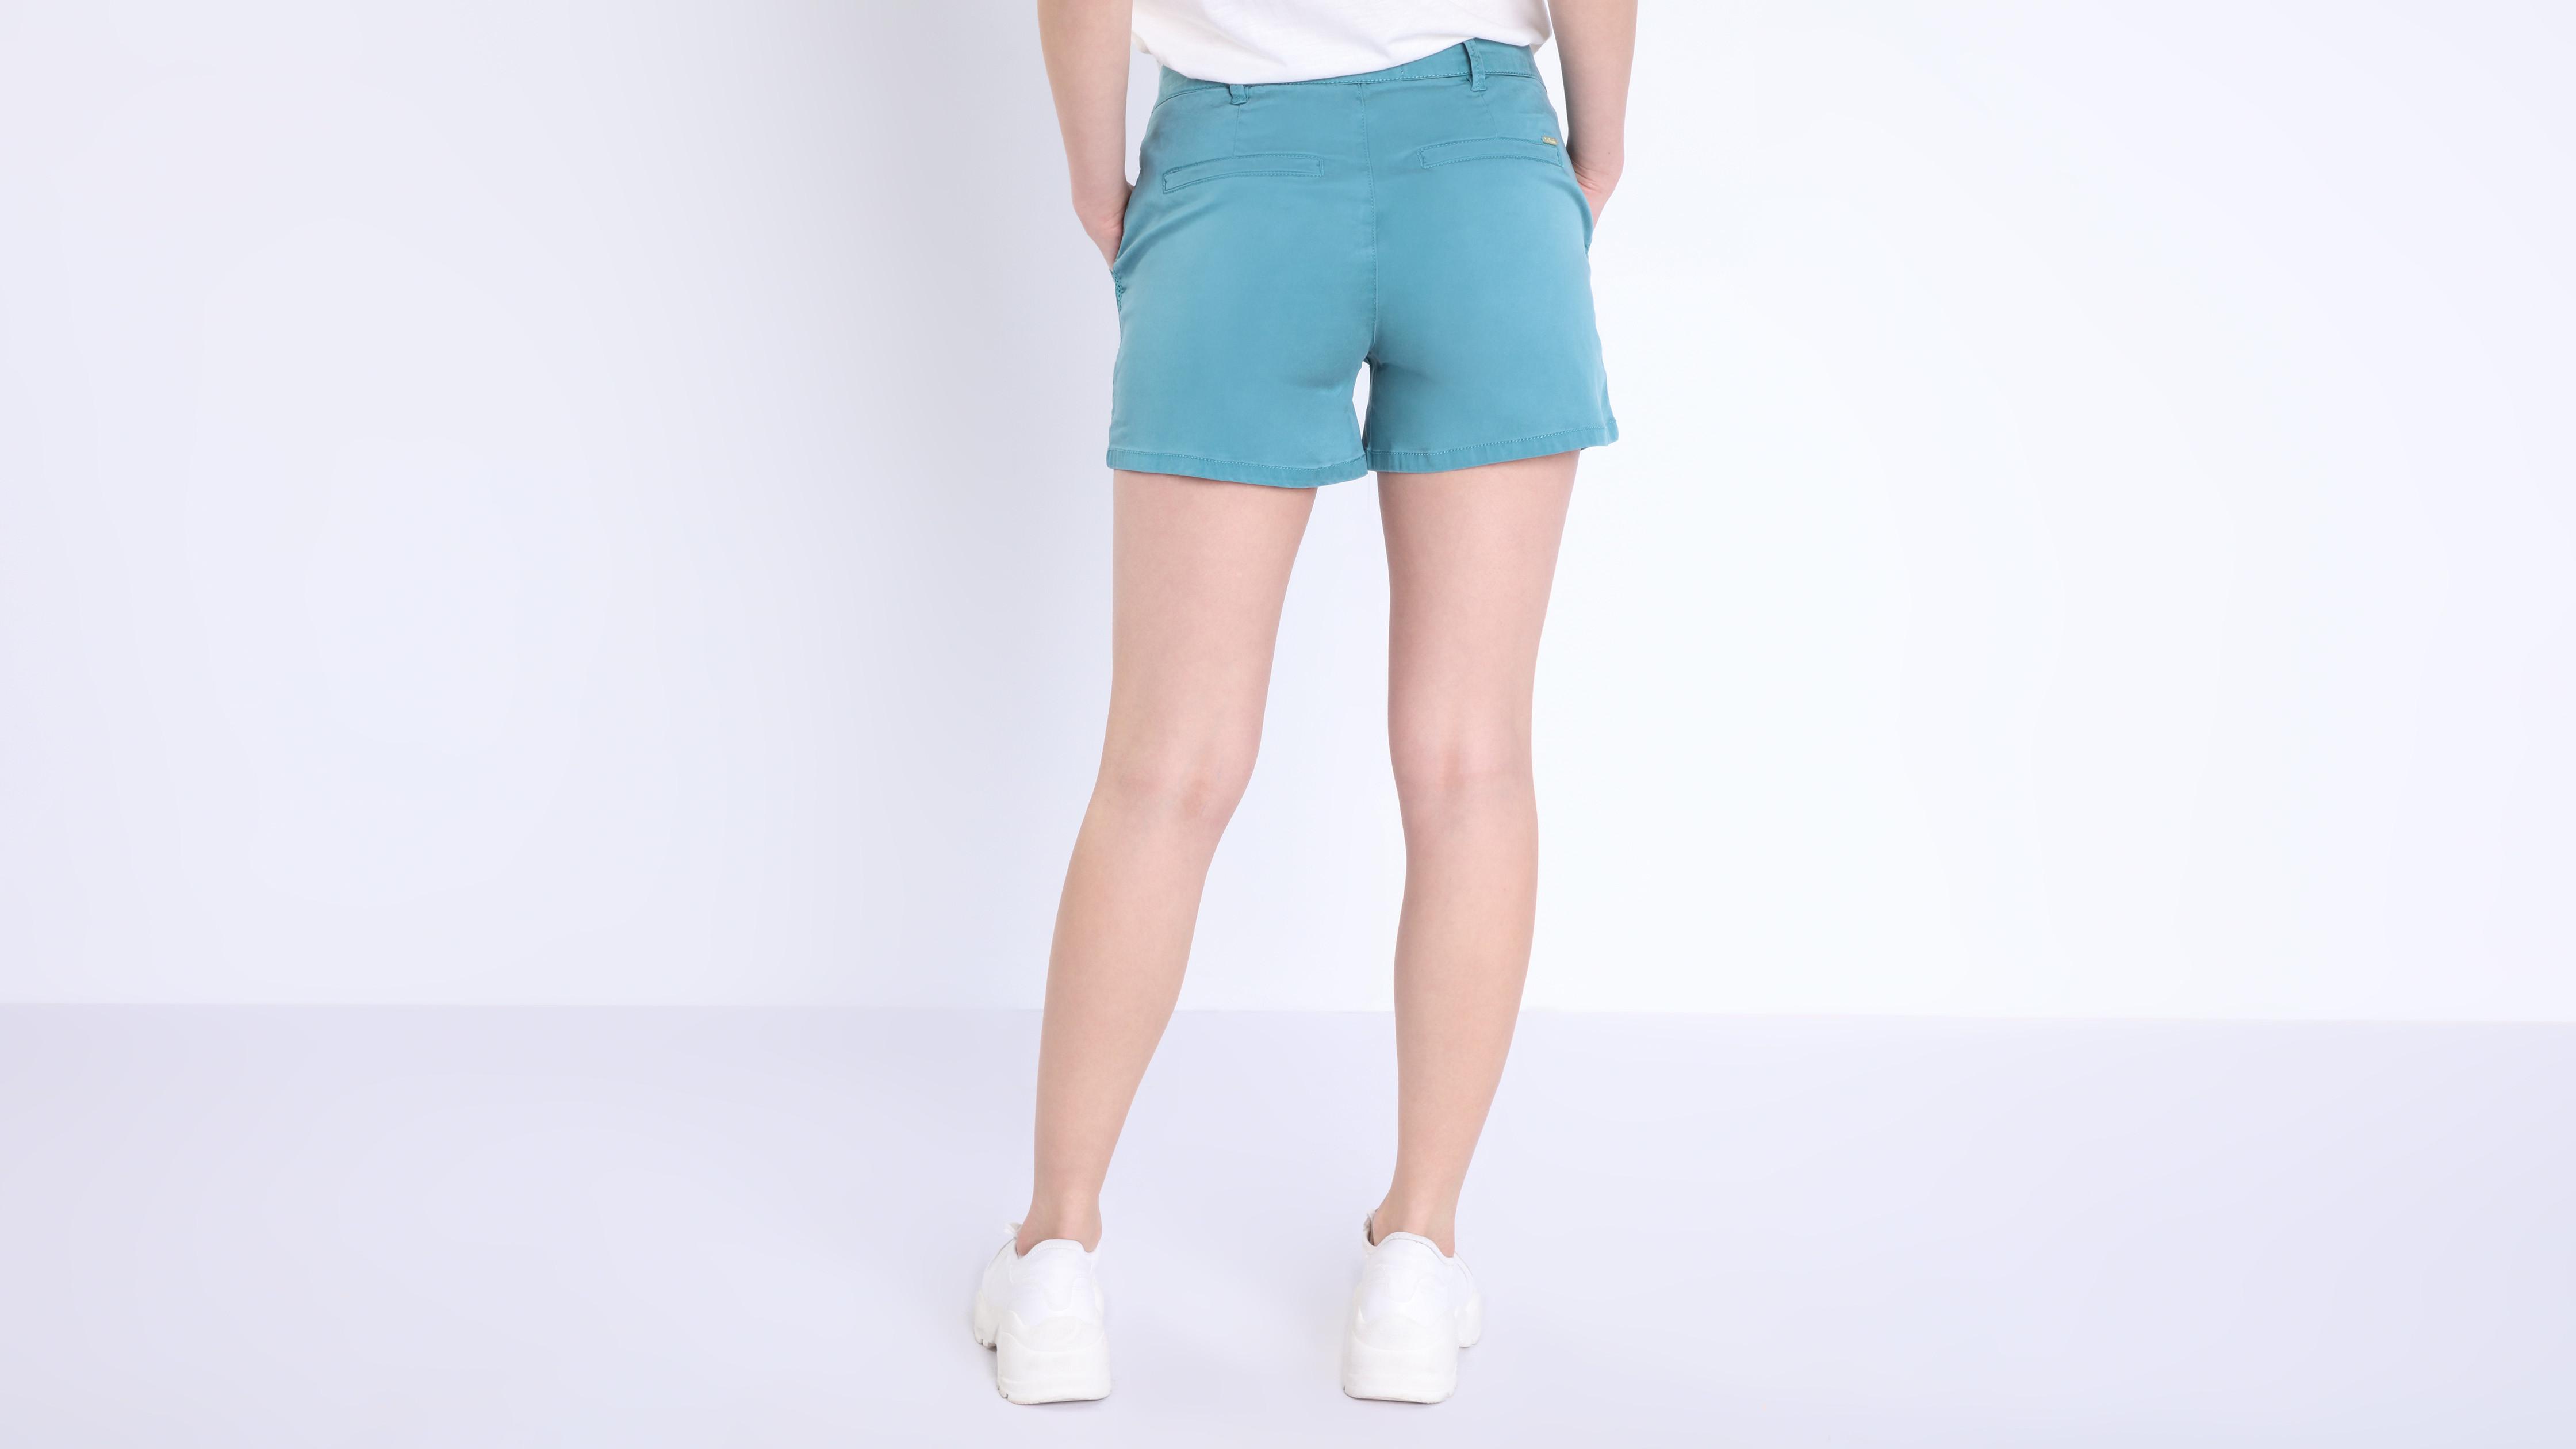 Pato Mujer Bolsillos Azul Shorts 4 Chino 4cal5rj3q u35T1lJcFK